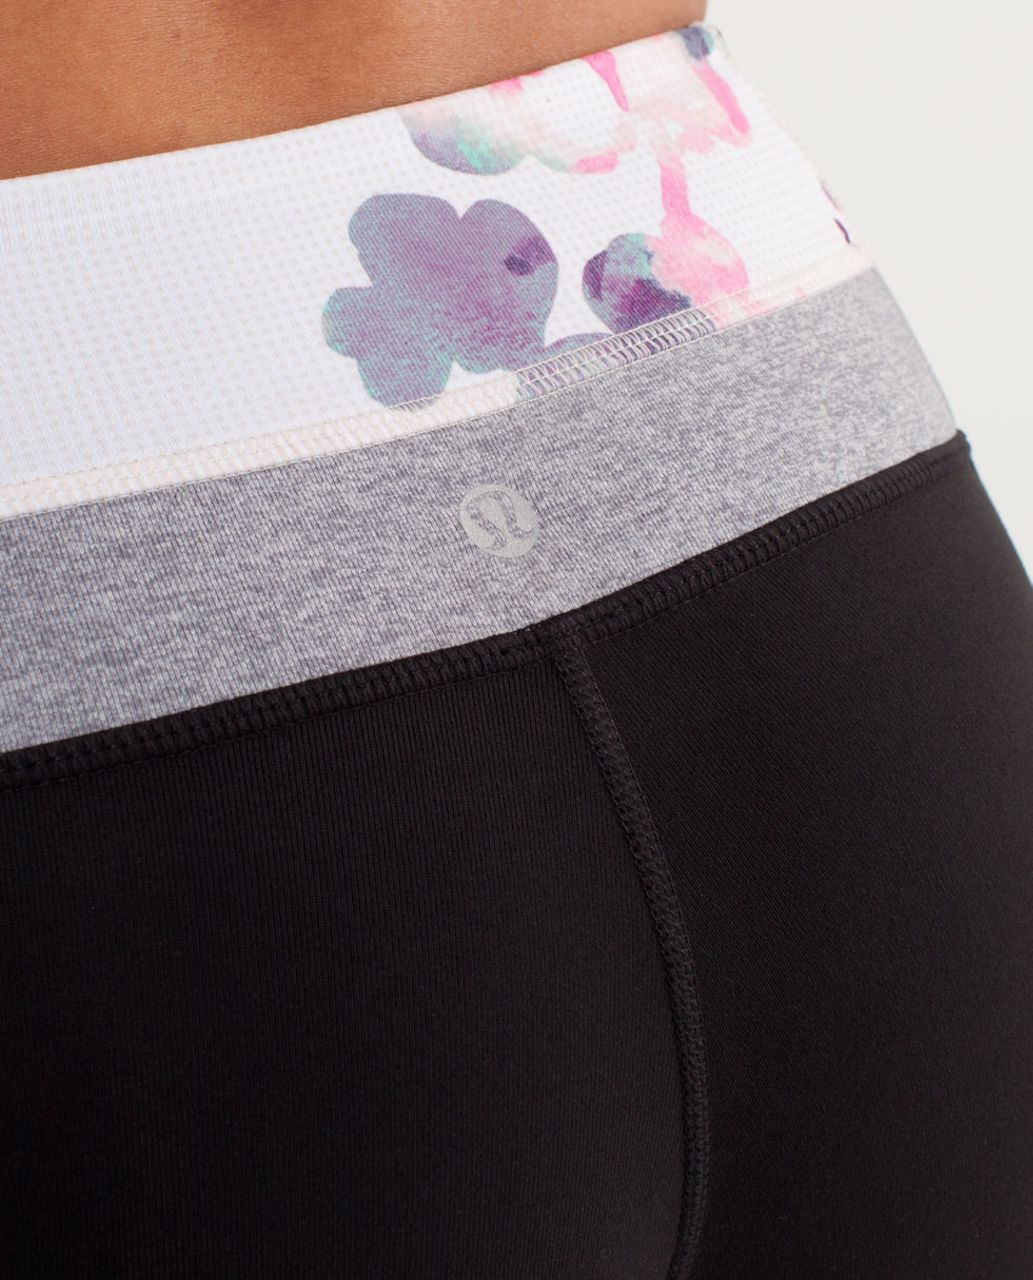 Lululemon Groove Pant (Regular) - Black / Blurred Blossoms Multi Colour / Heathered Fossil